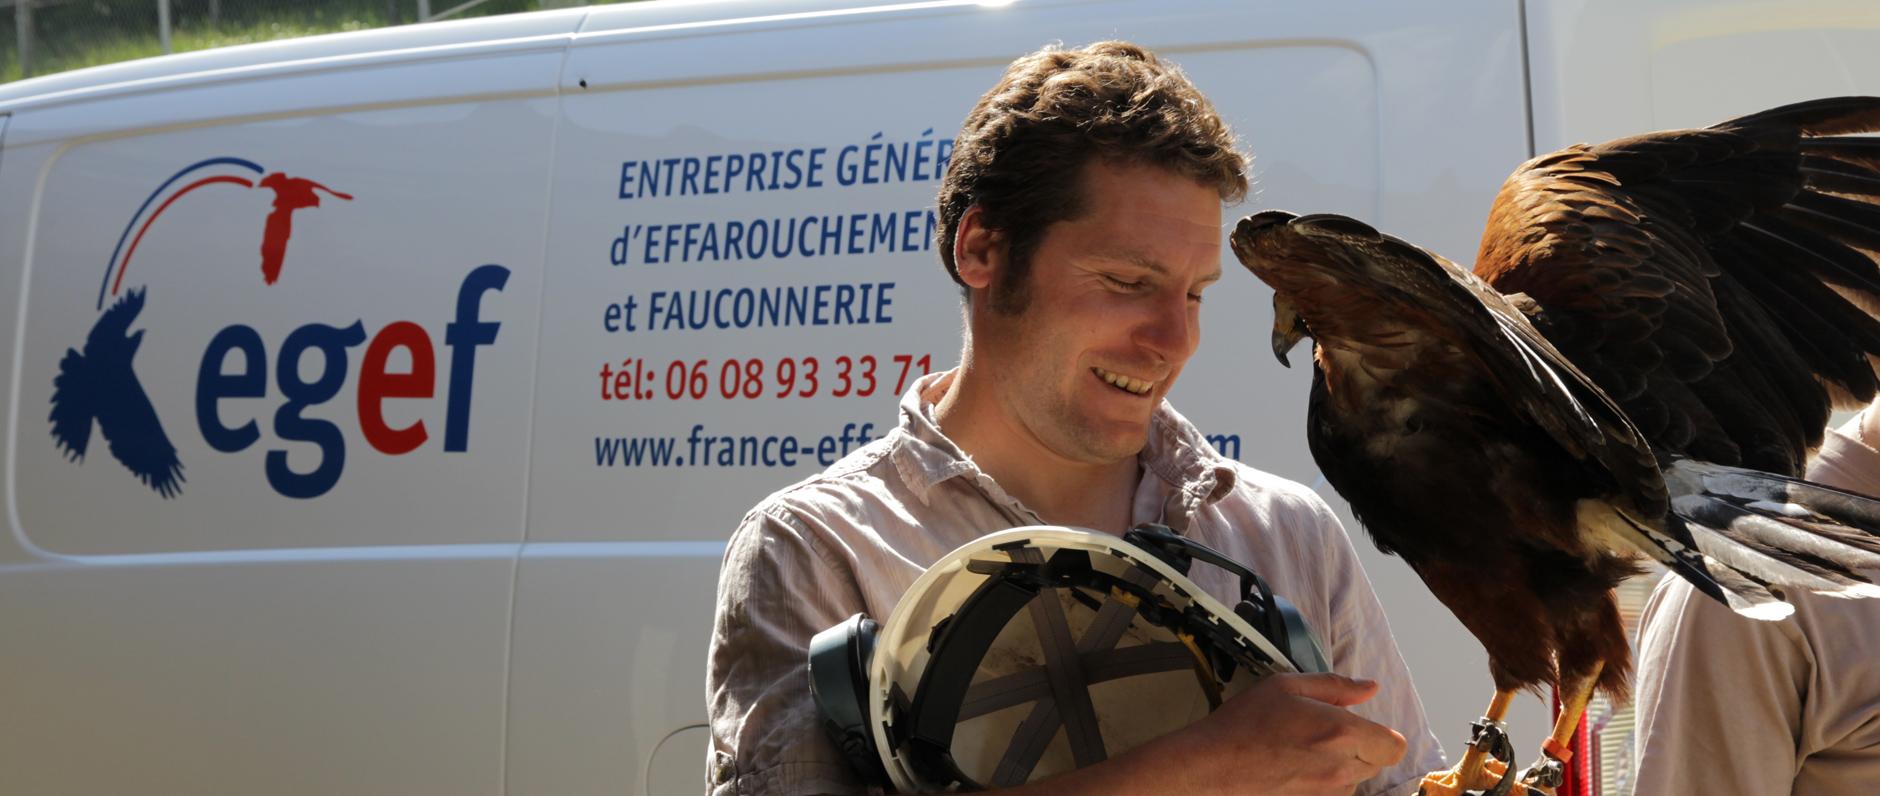 EGEF - France effarouchement